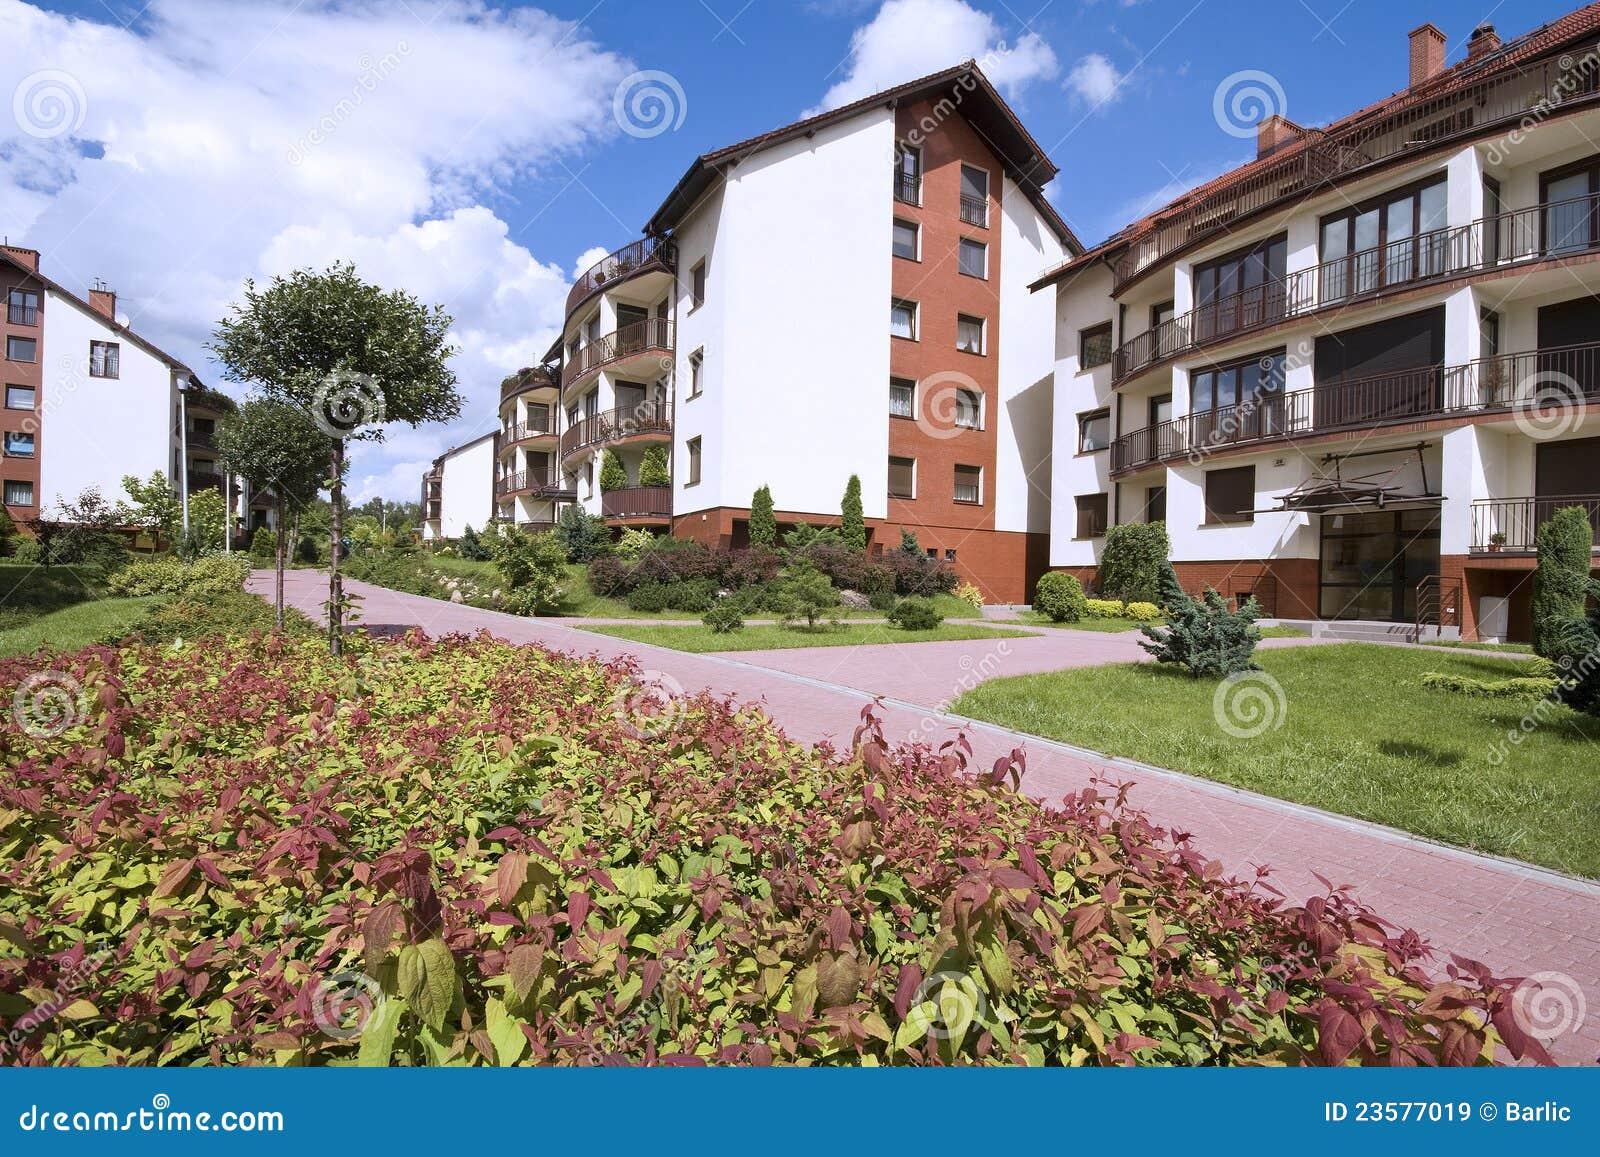 Palazzine di appartamenti urbane moderne immagine stock for Palazzine moderne